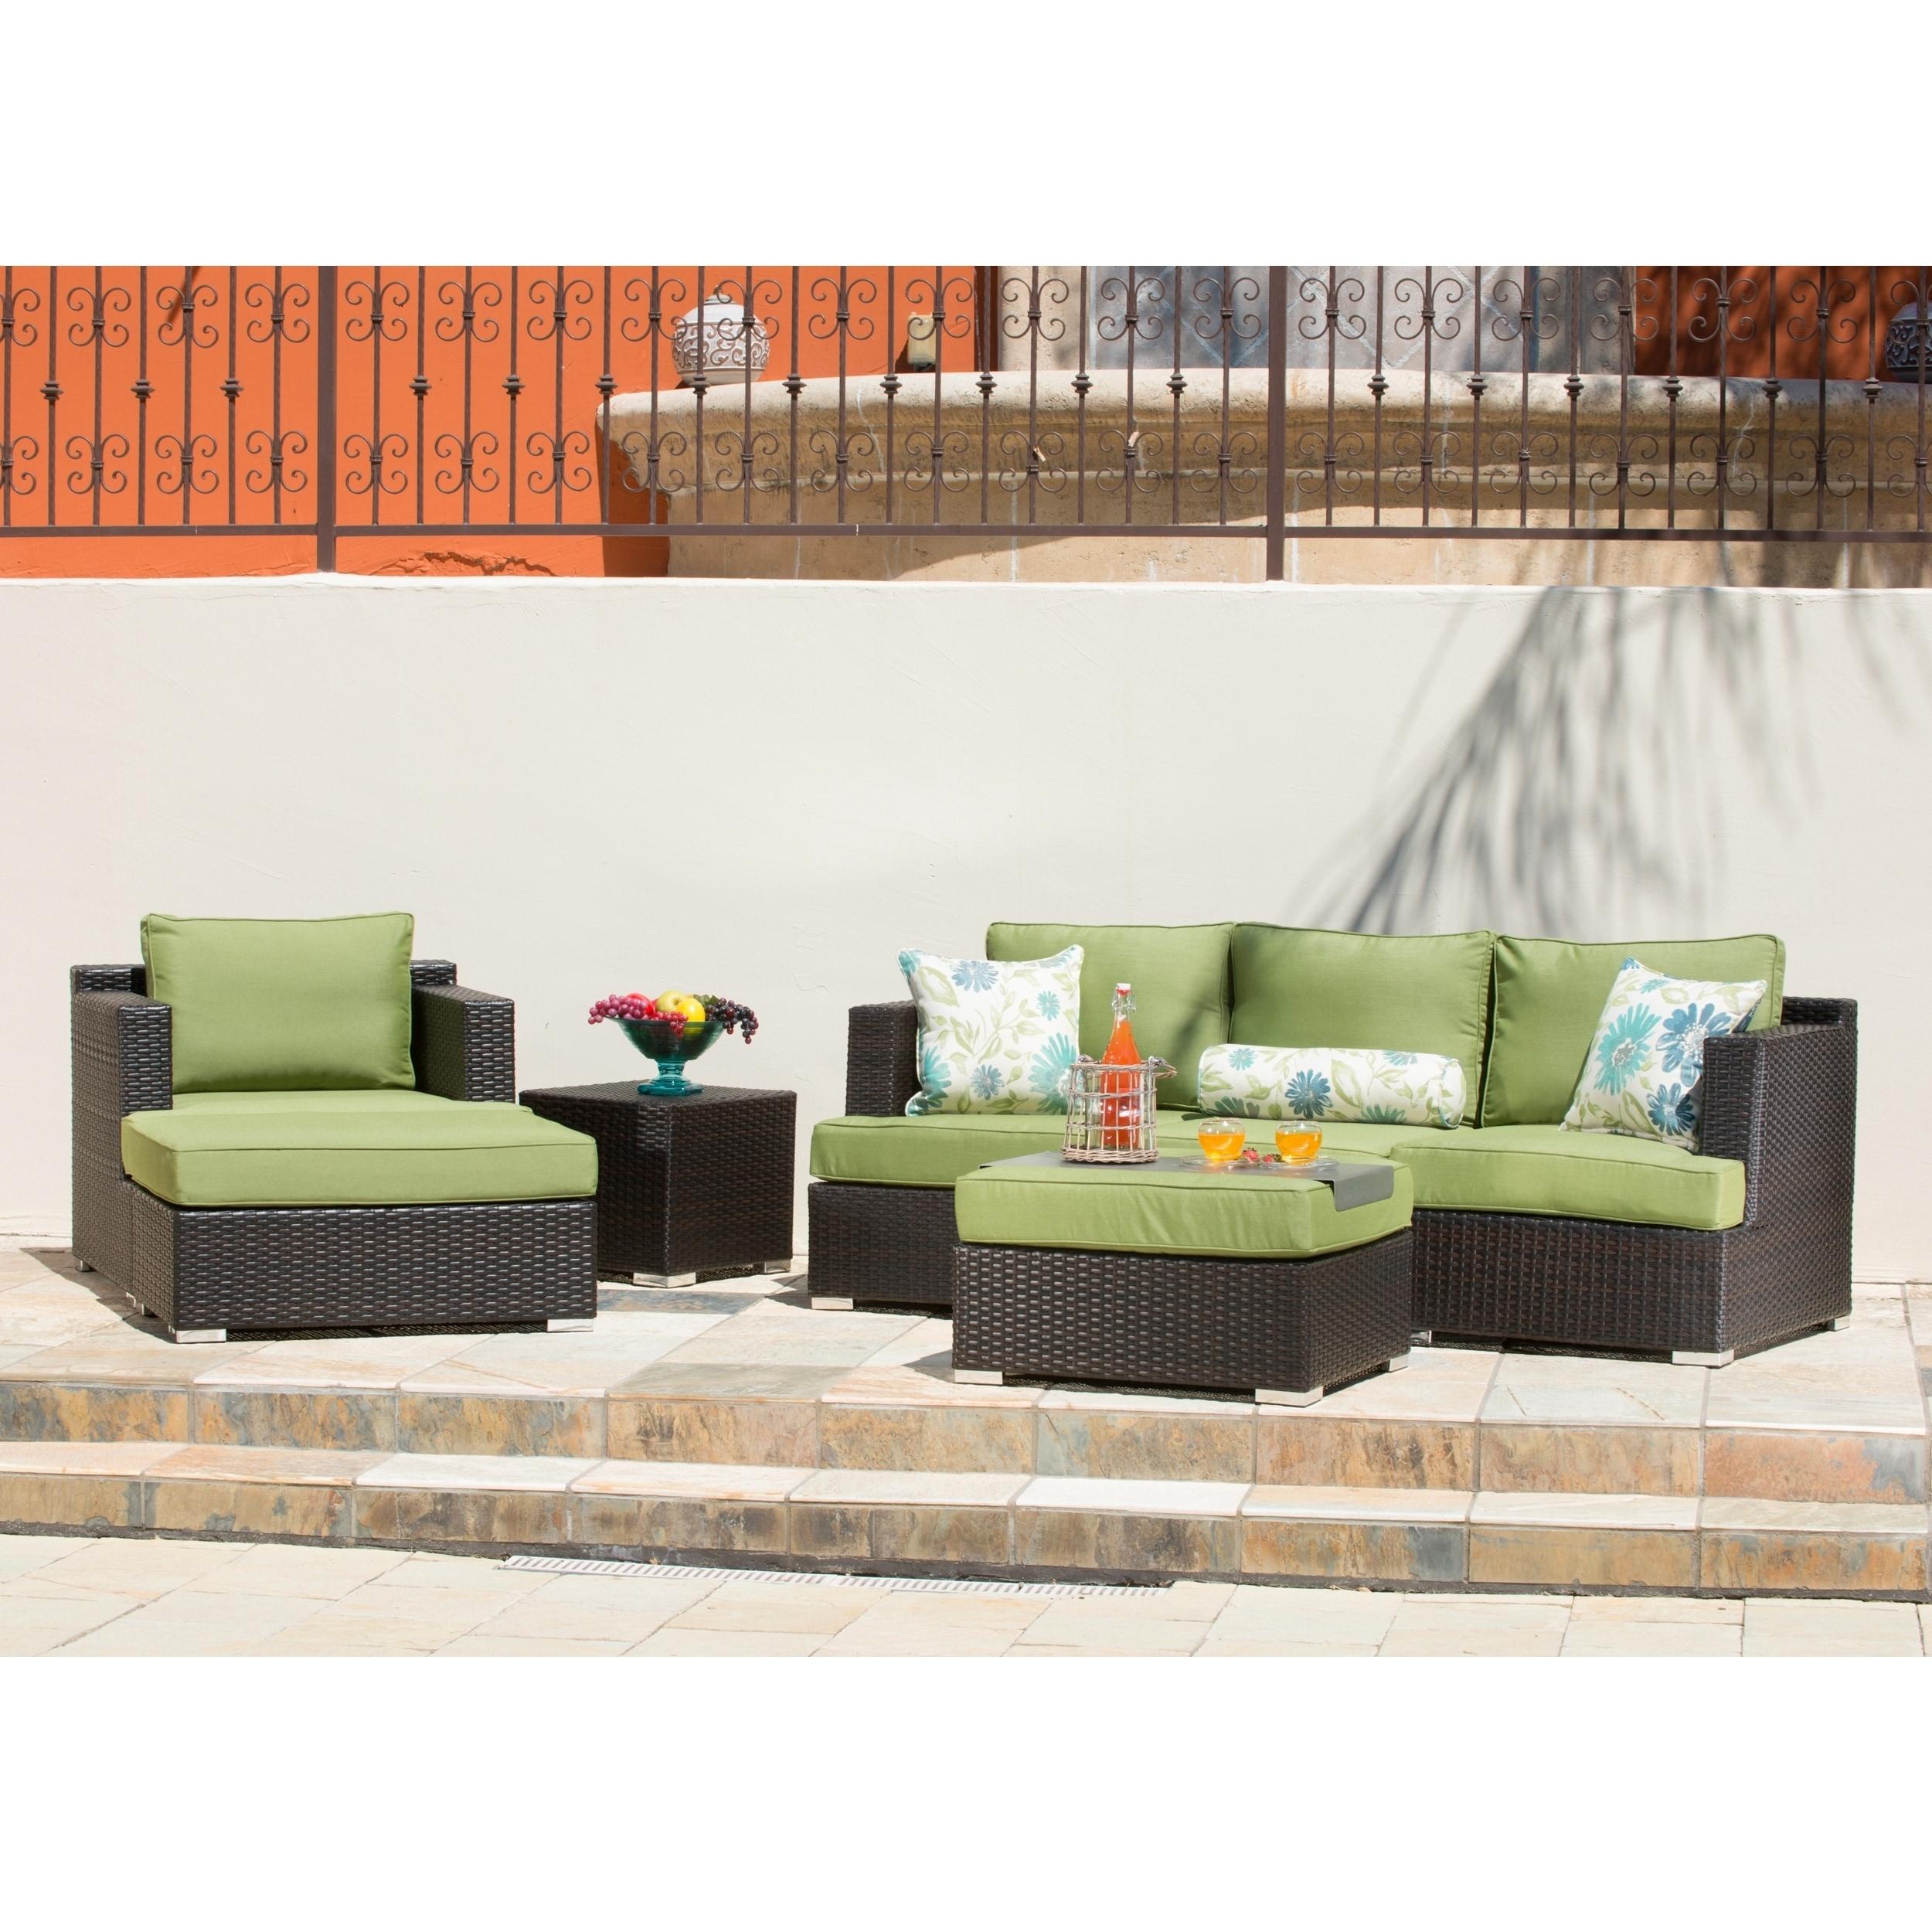 Corvus Morgan Outdoor 7-piece Brown Wicker Sectional Sofa Set with  Sunbrella Cushions